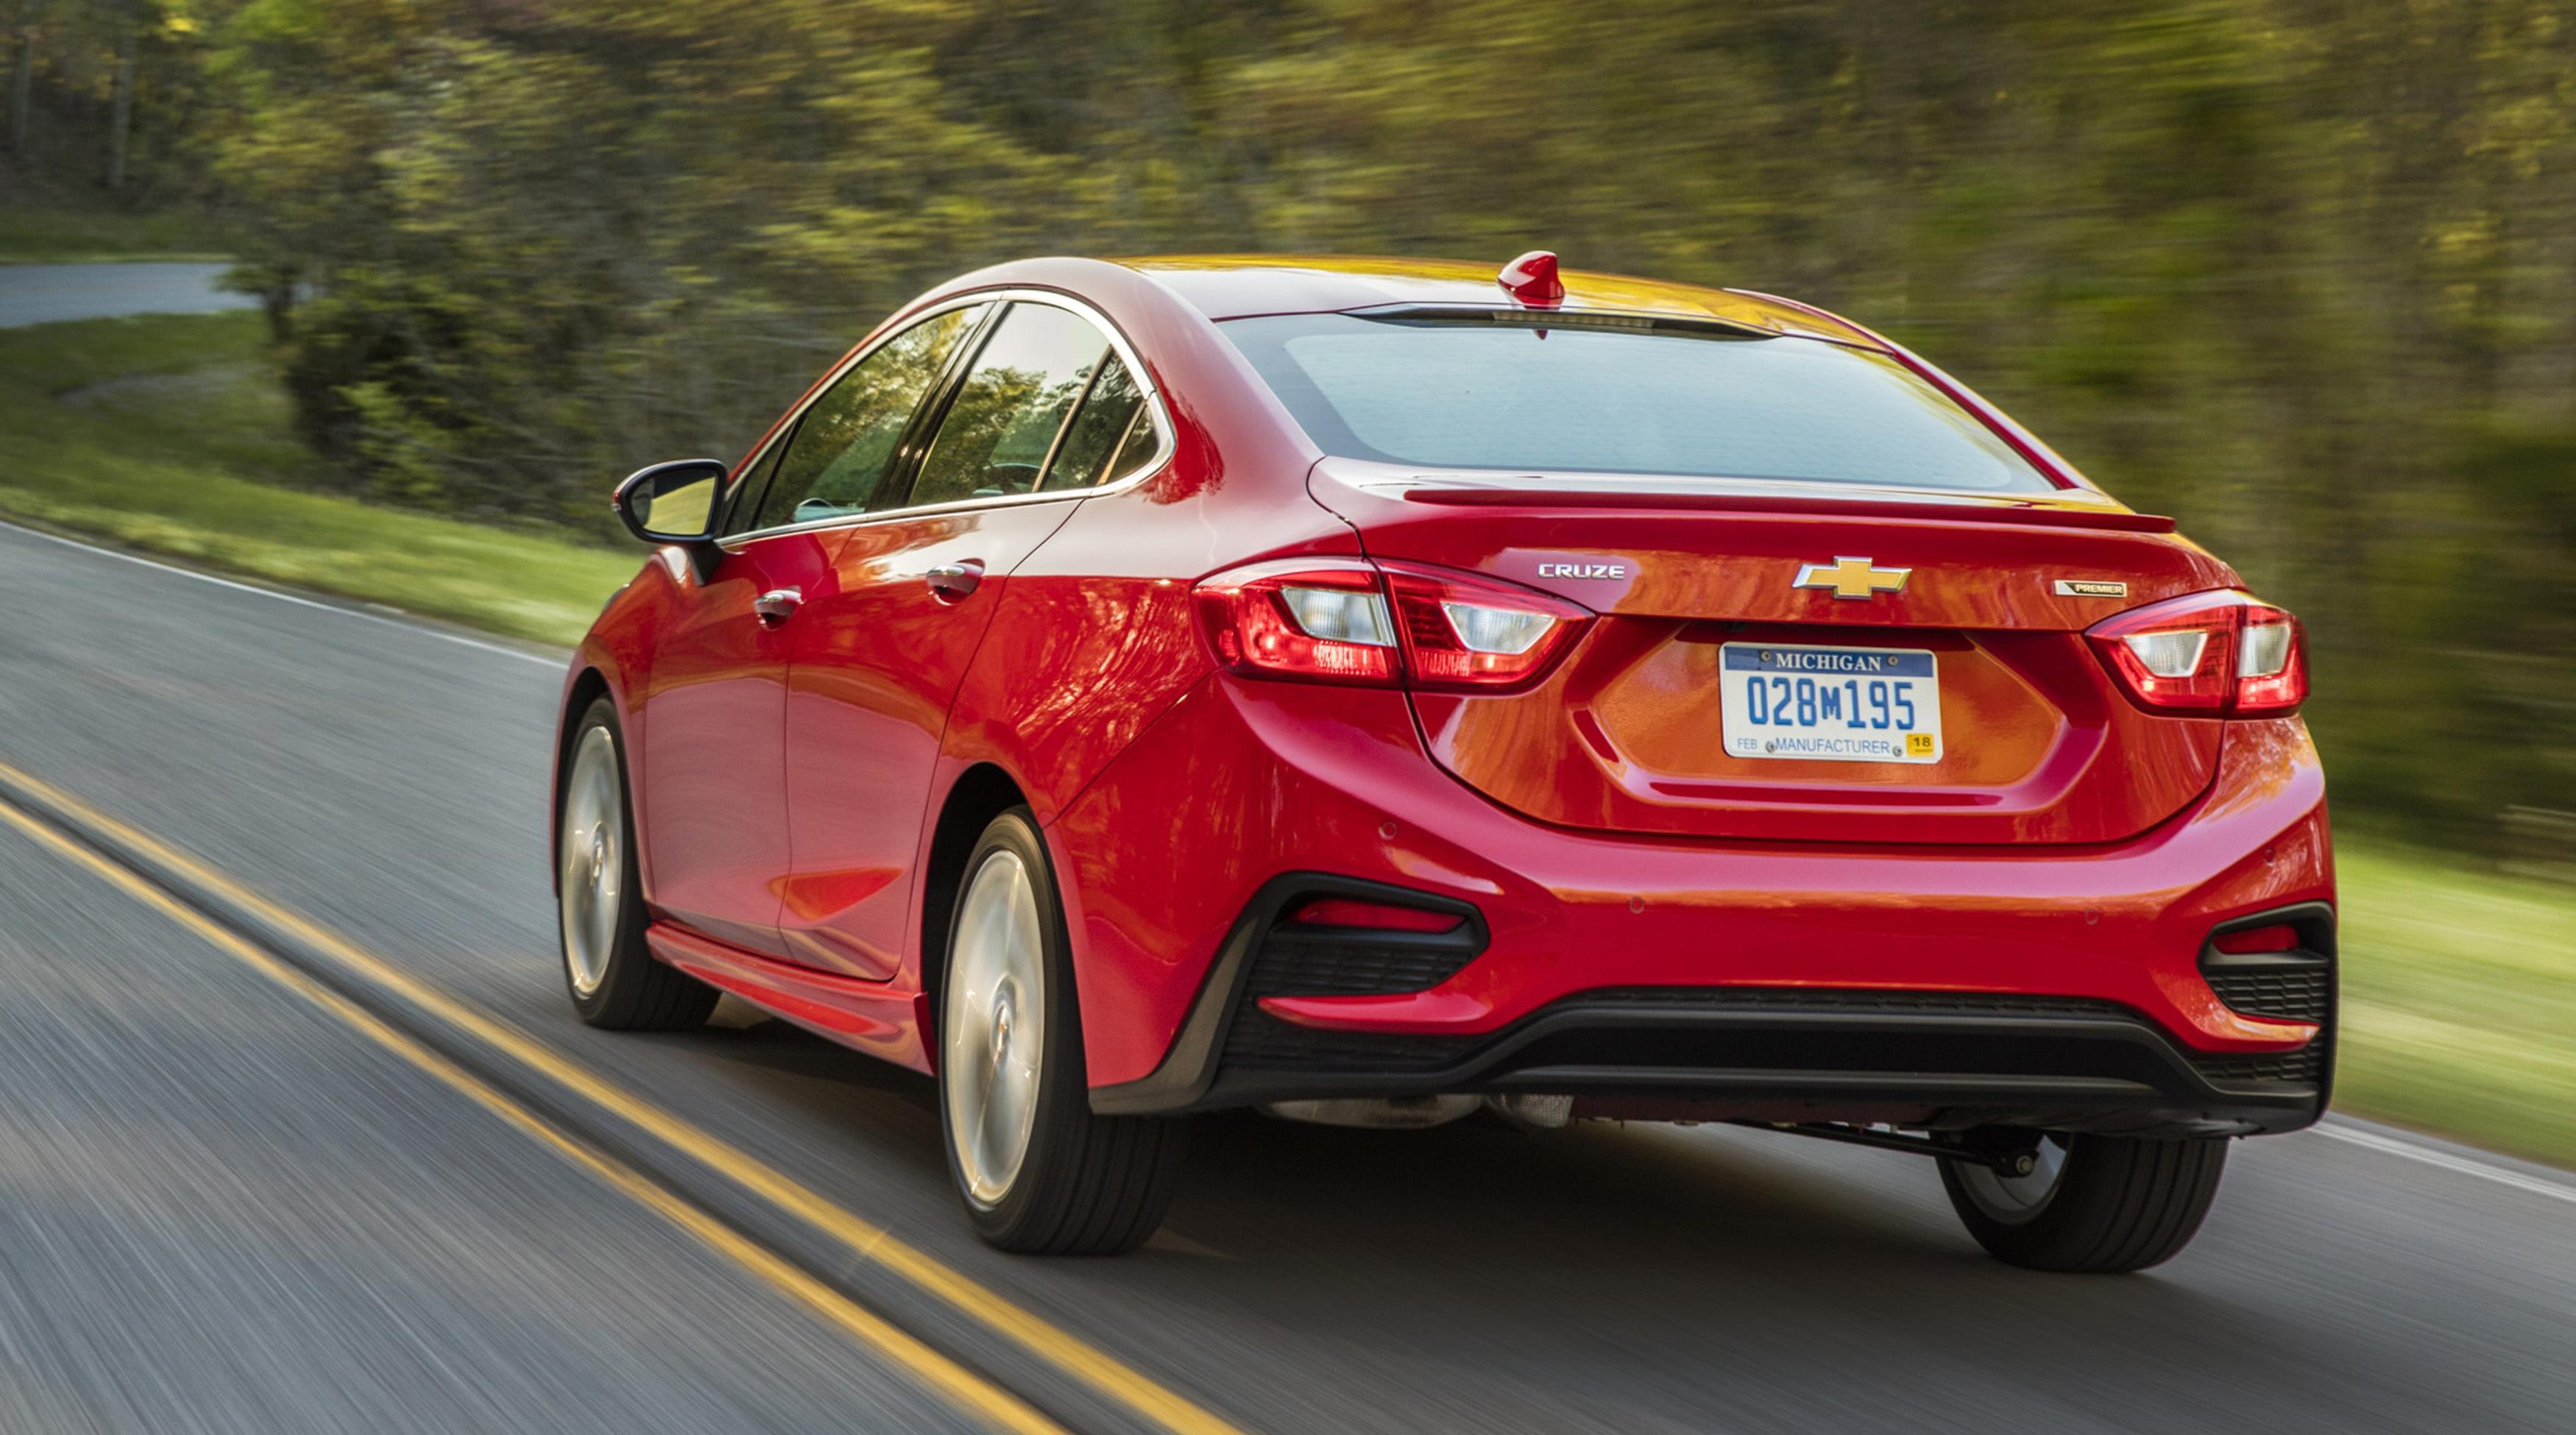 2016-Chevrolet-Cruze-044.jpg